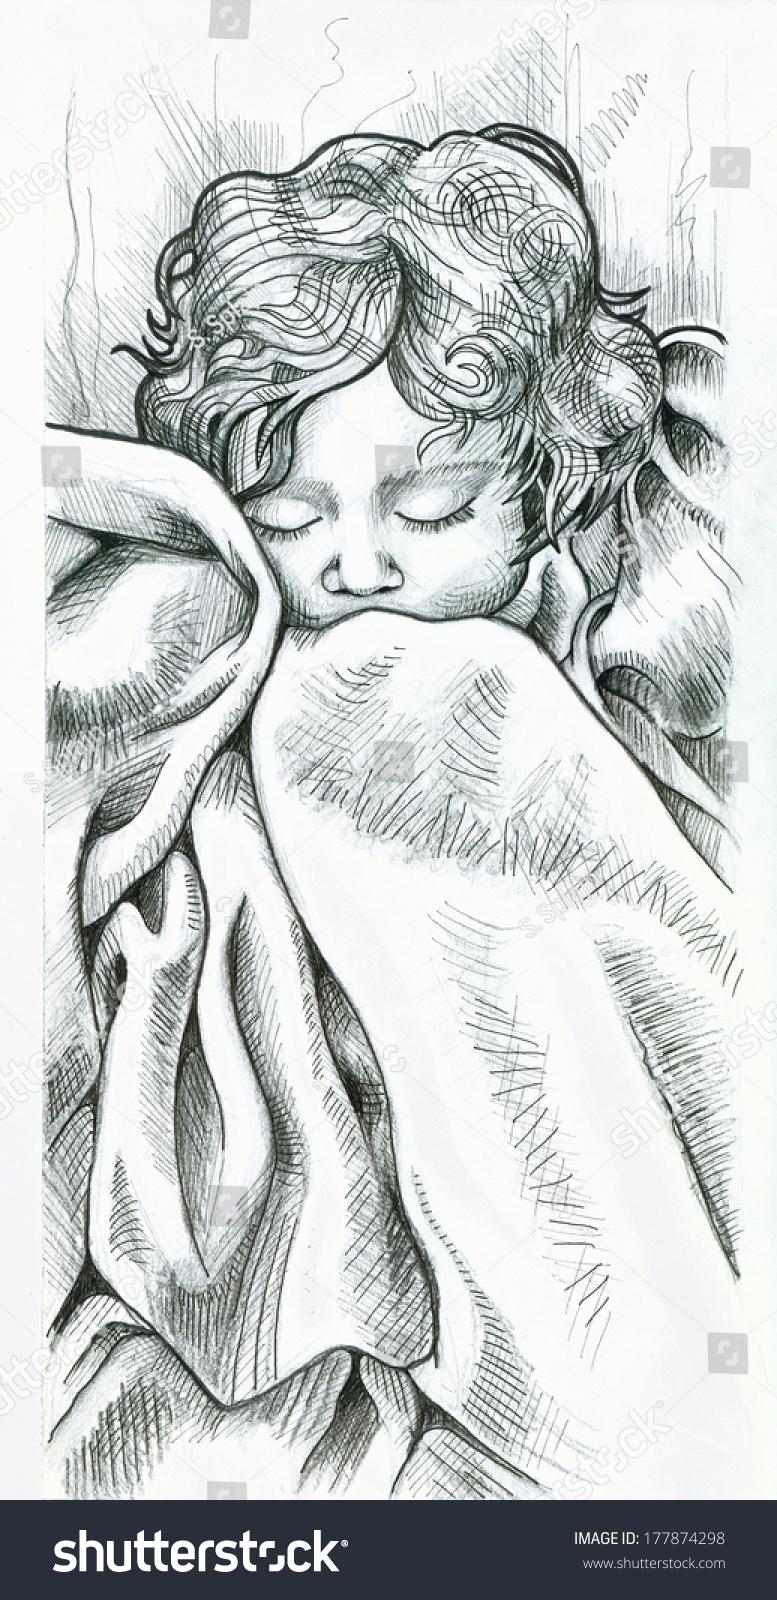 Peaceful baby sleeping pencil drawing